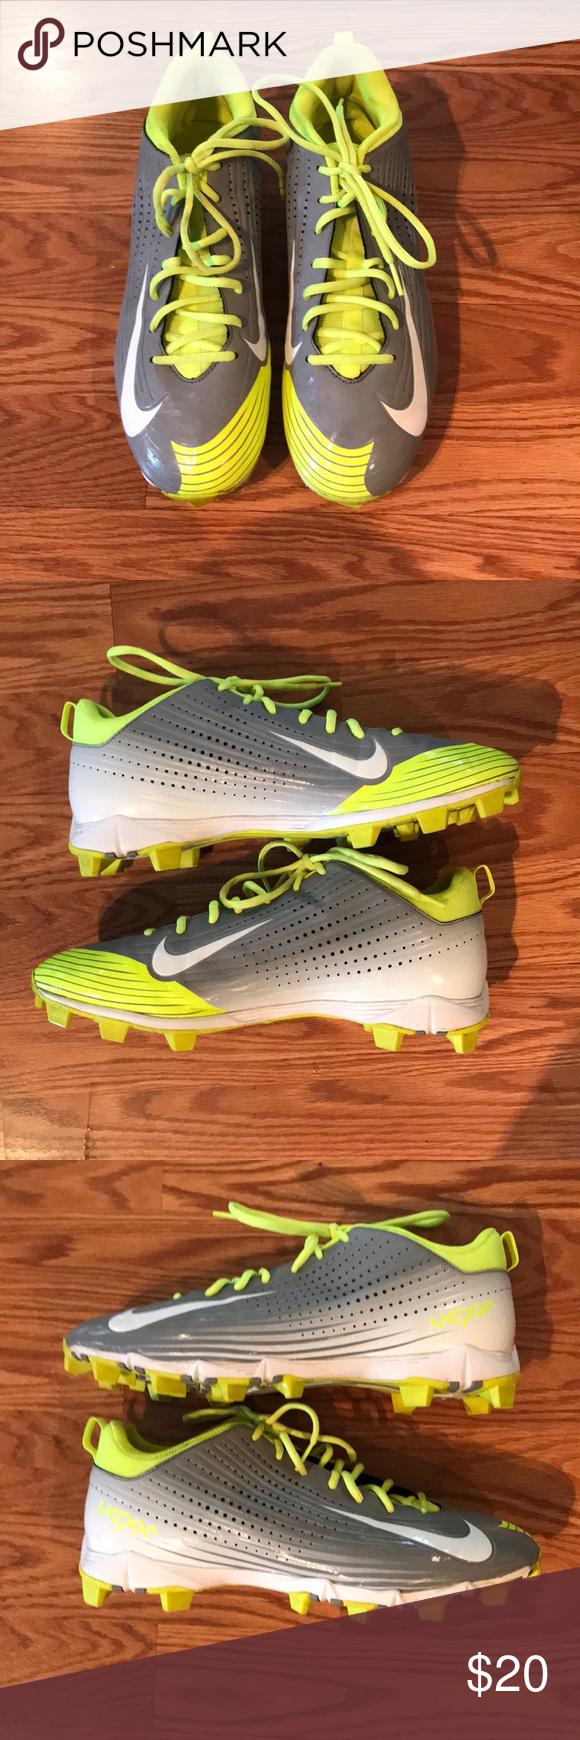 Nike men, Baseball cleats, Neon yellow